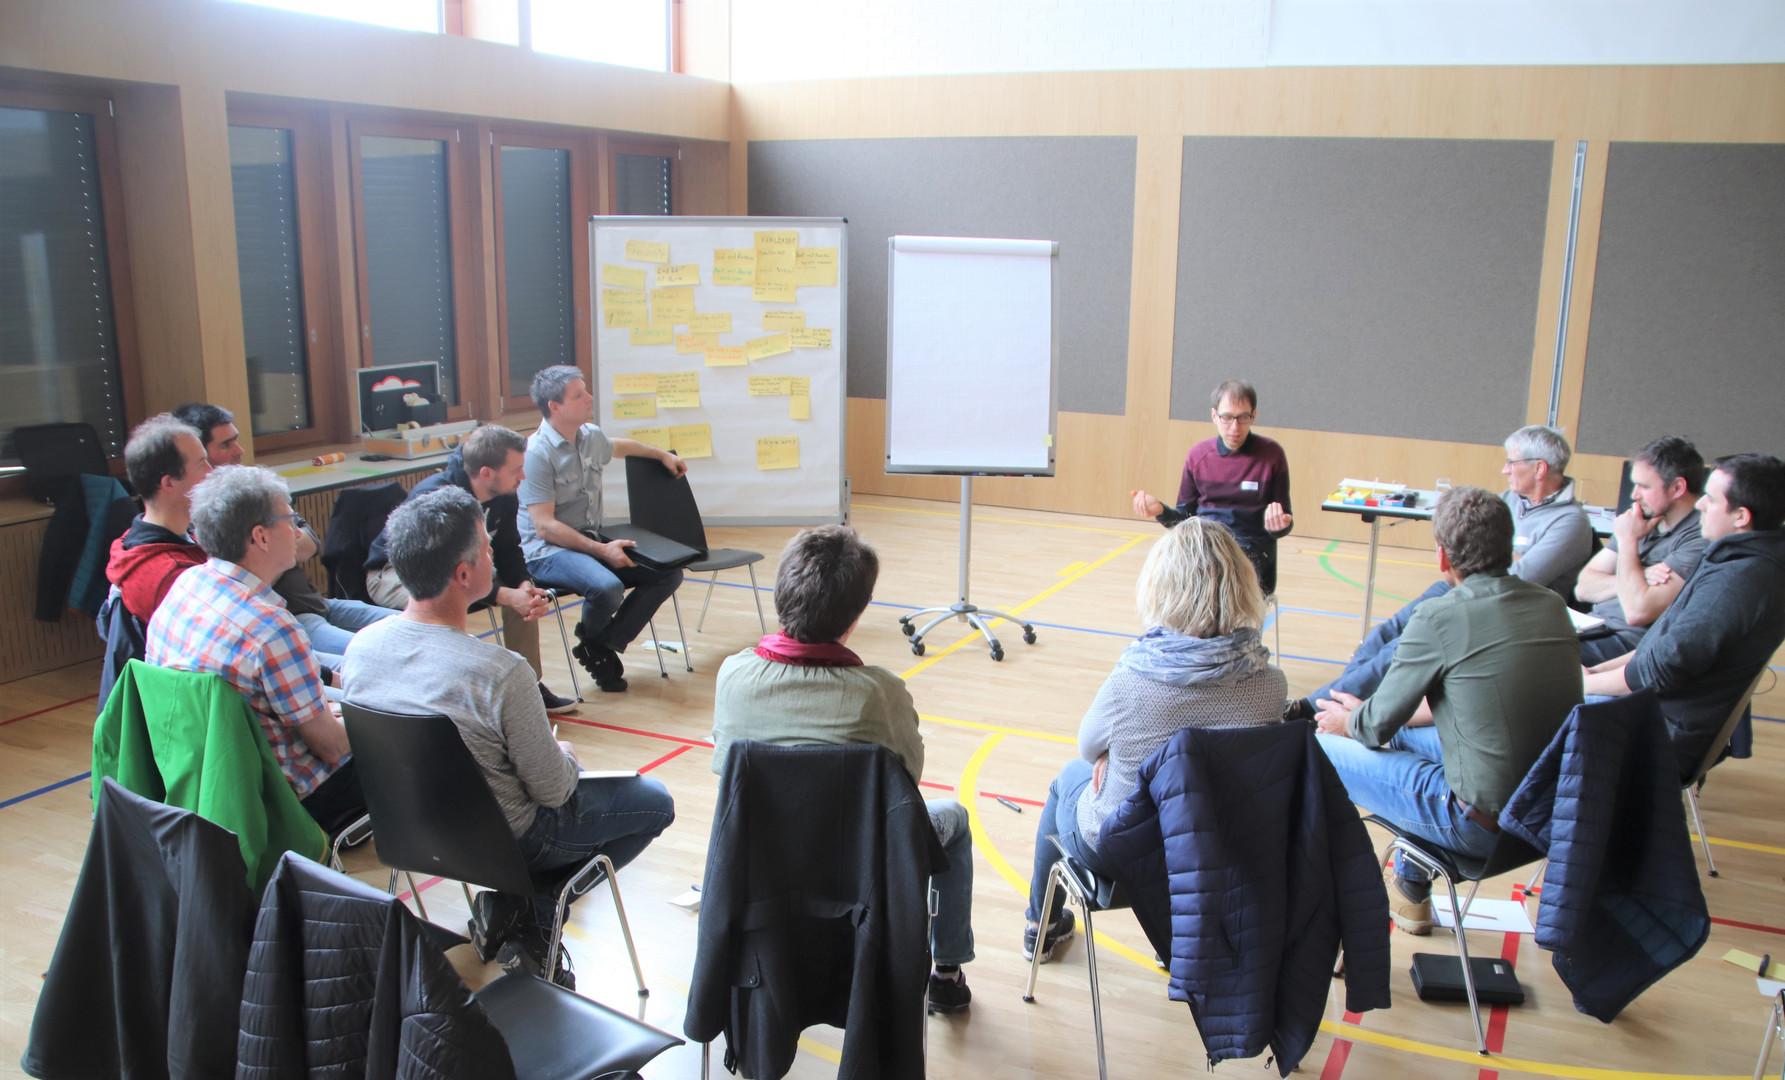 Arenenberg Profitag Milch Workshop.JPG